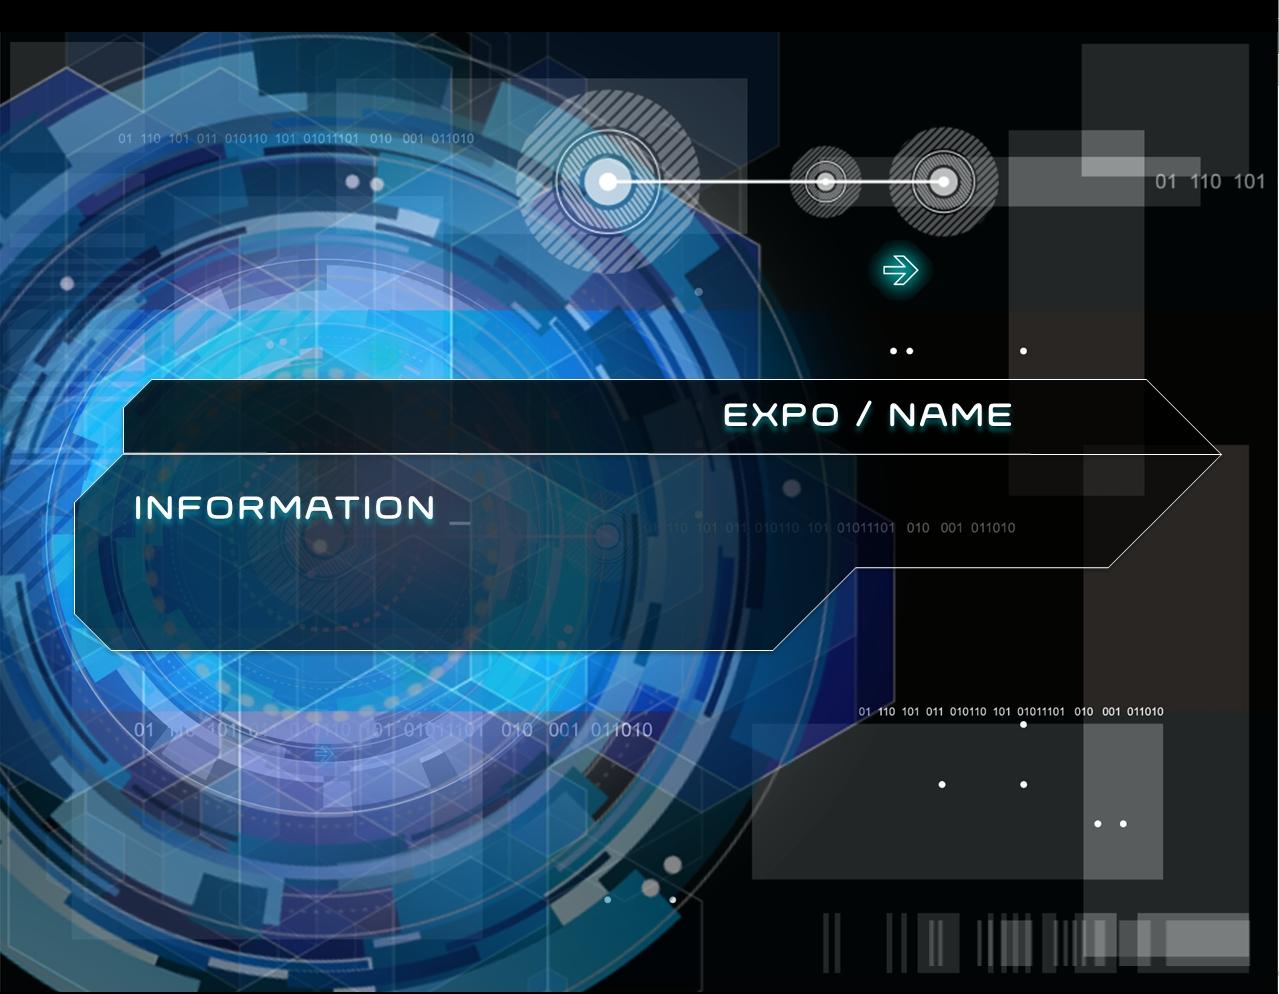 3d Hologram Wallpaper App Hitech Powerpoint Template By Evilskills On Deviantart